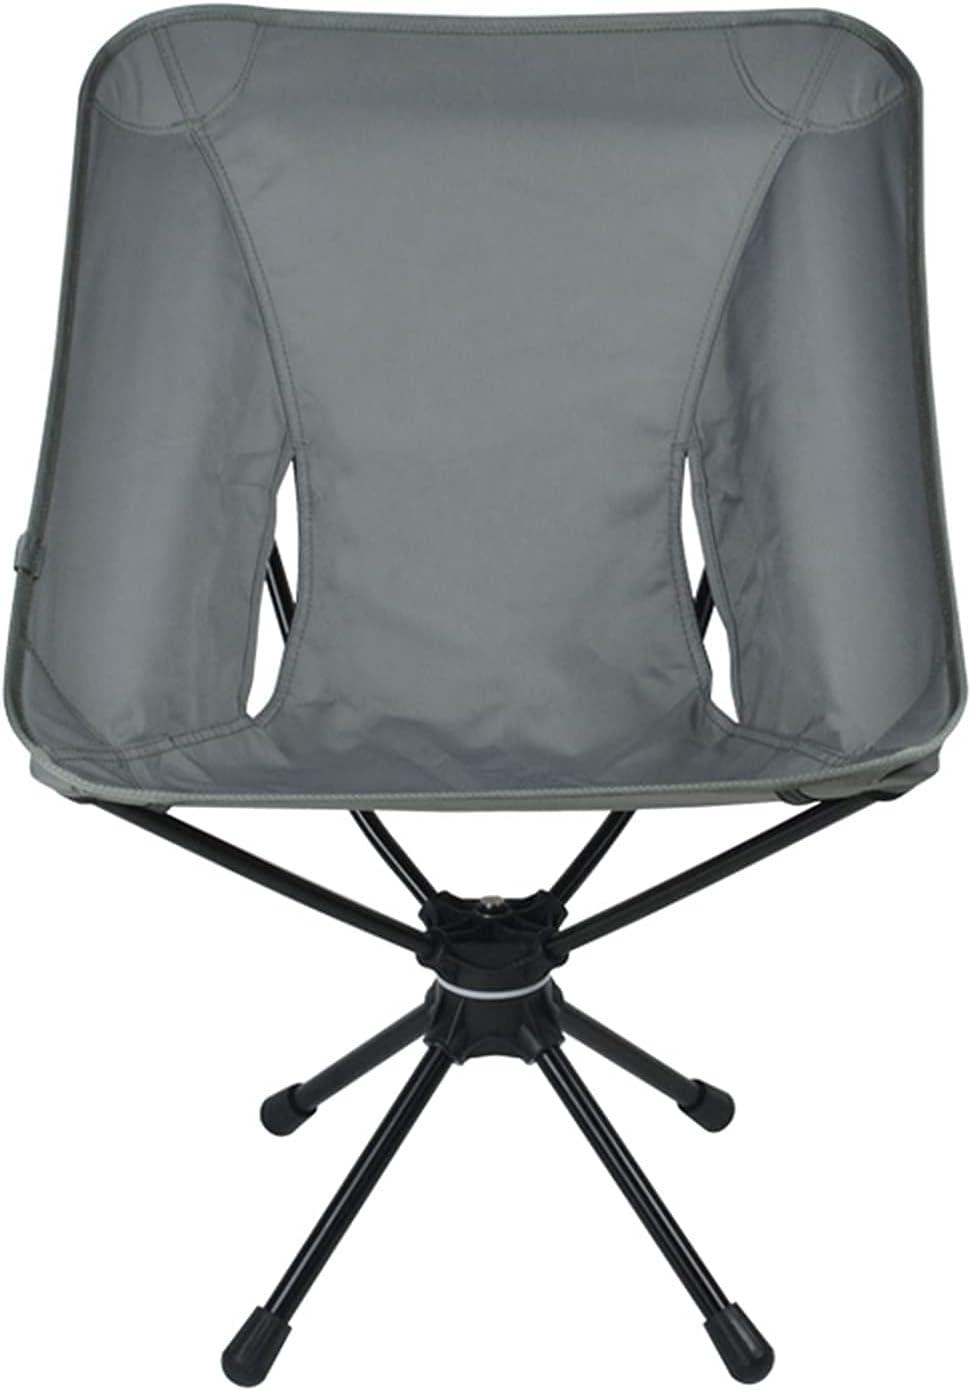 Compact Outdoor Chair Beach 360 Lightweight Folding Max 84% OFF Degre Seattle Mall